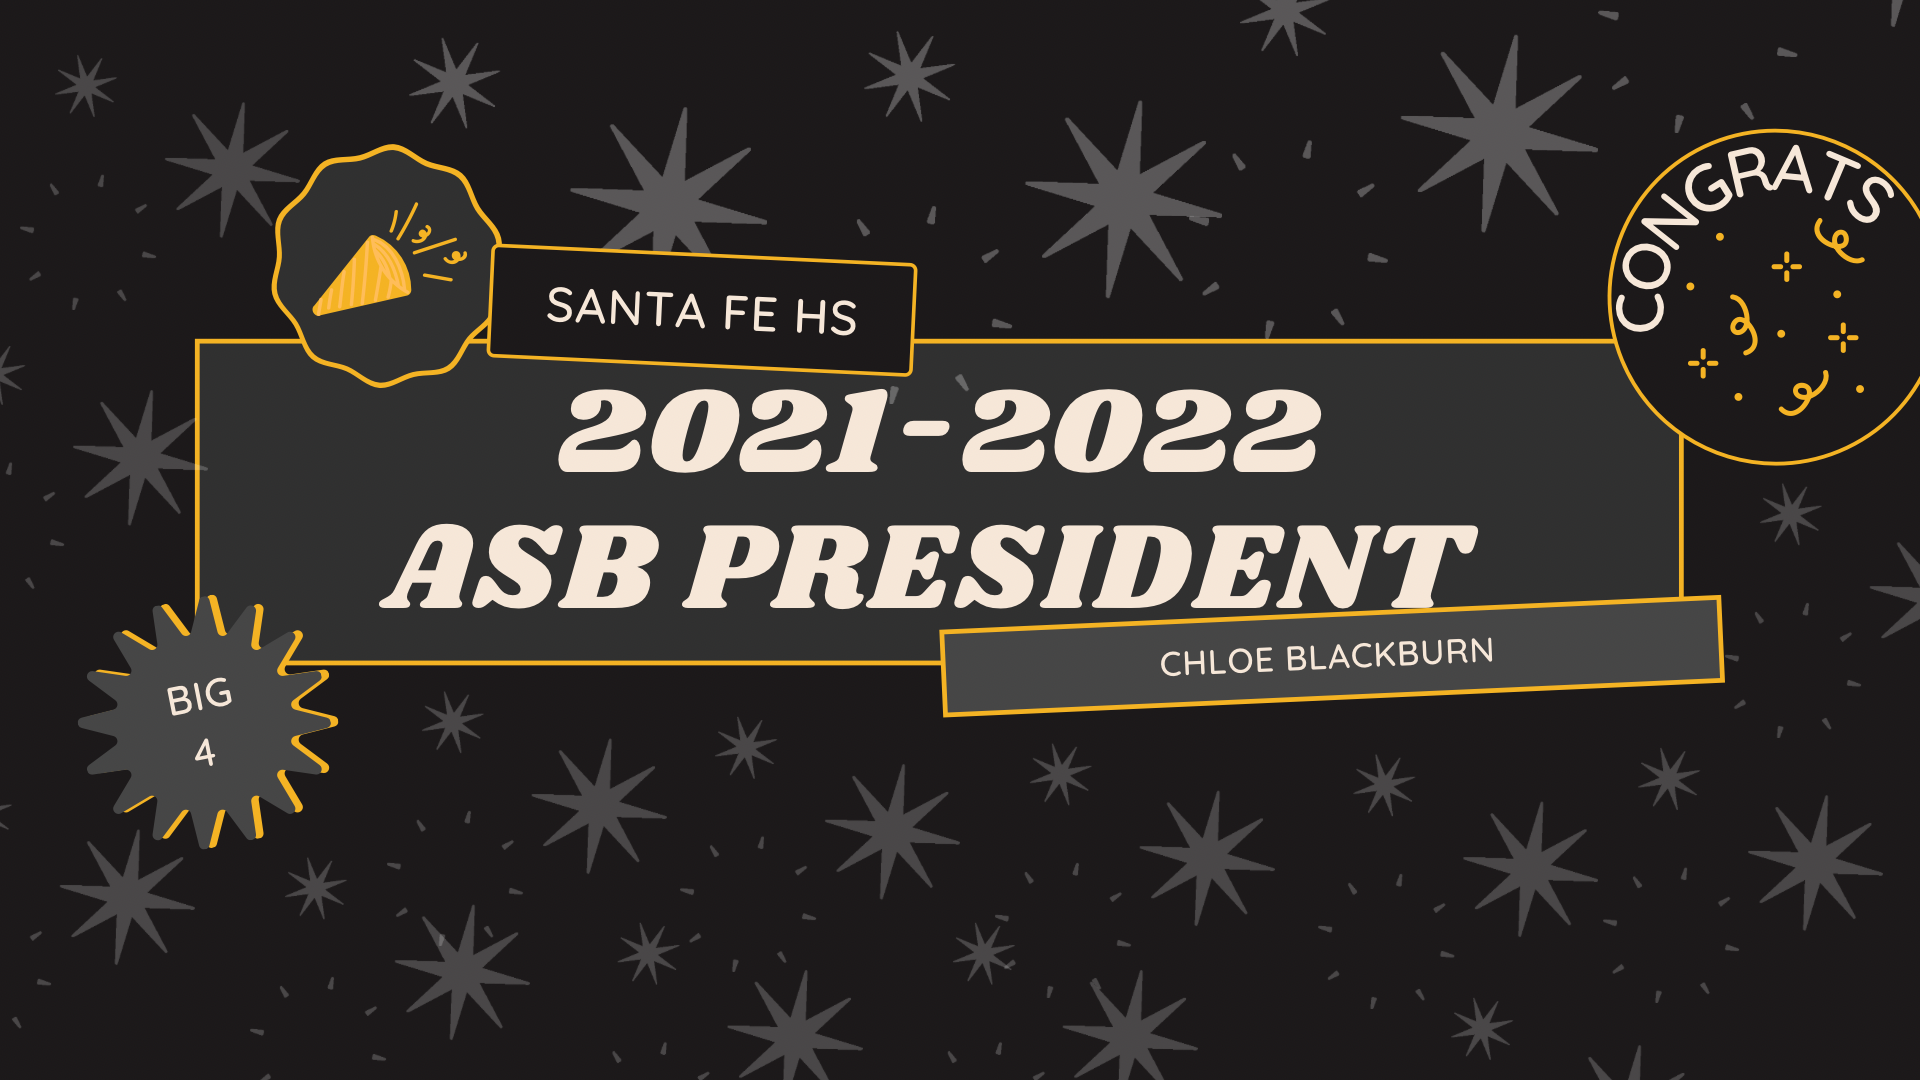 ASB President